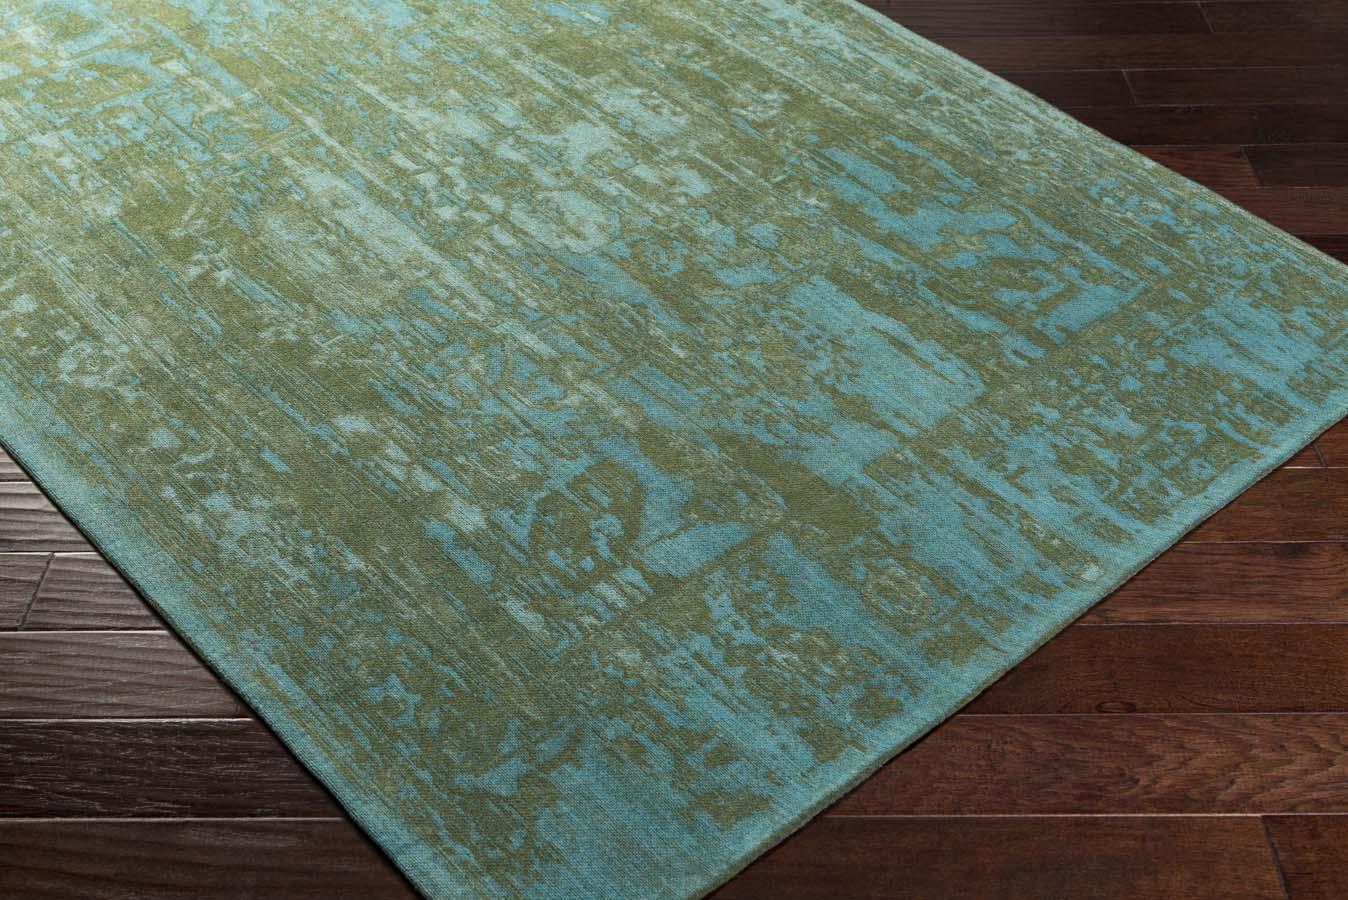 Artistic Weavers Elegant Awet 3069 Maya Green Teal Rug